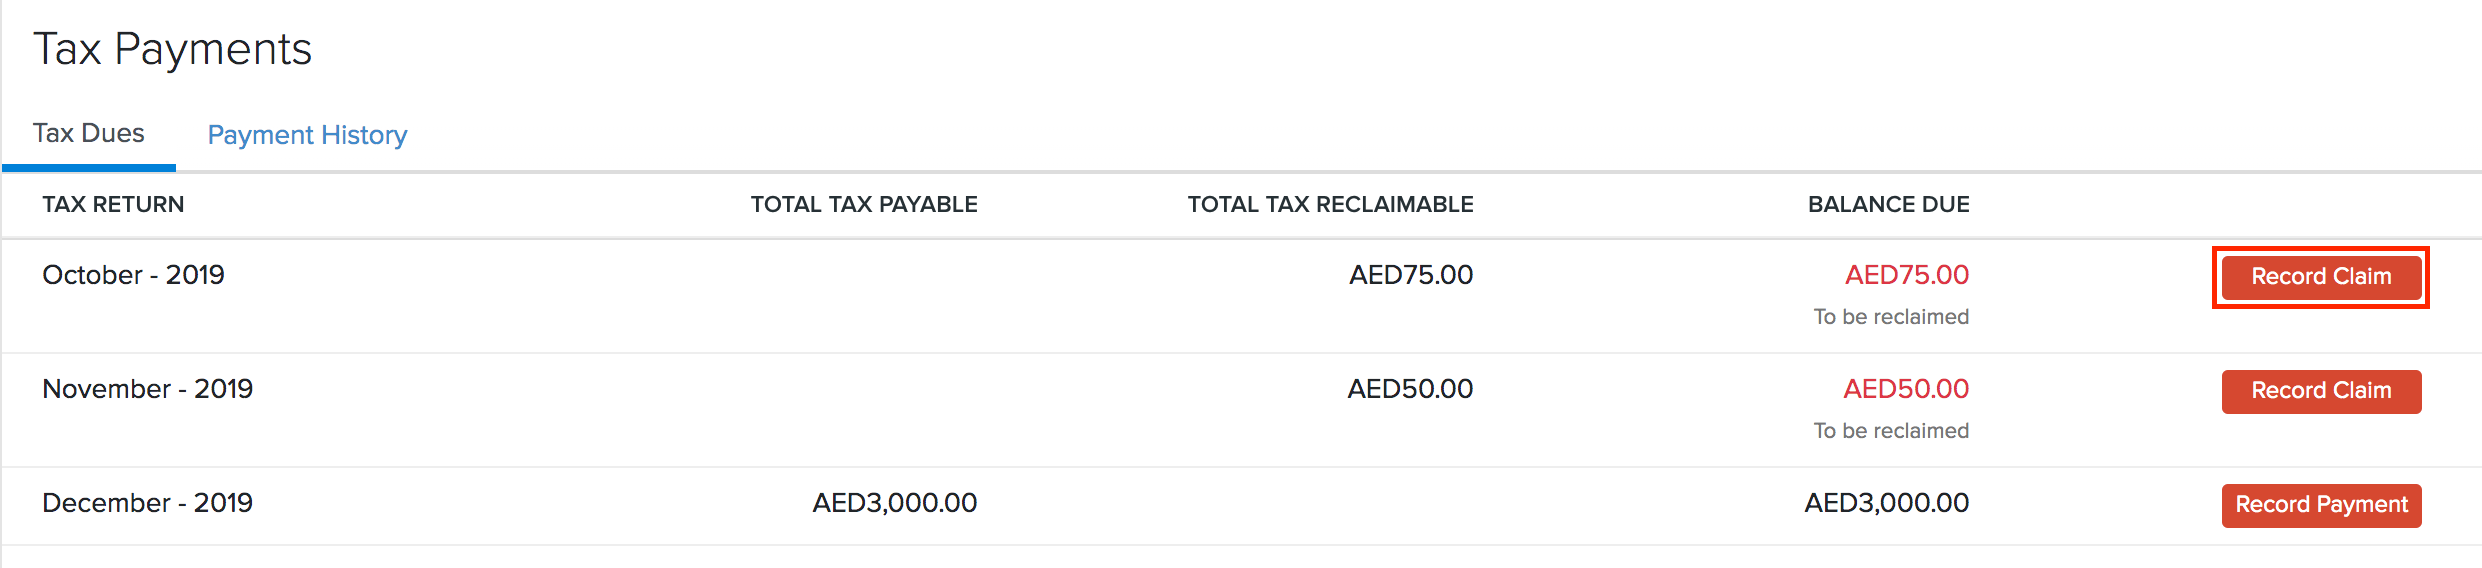 Tax Claim-Accountant